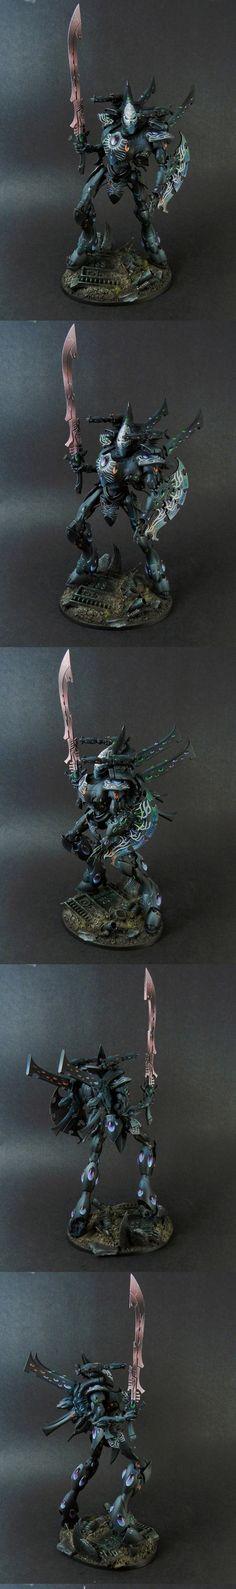 Eldar Wraithknight Death Jester Style